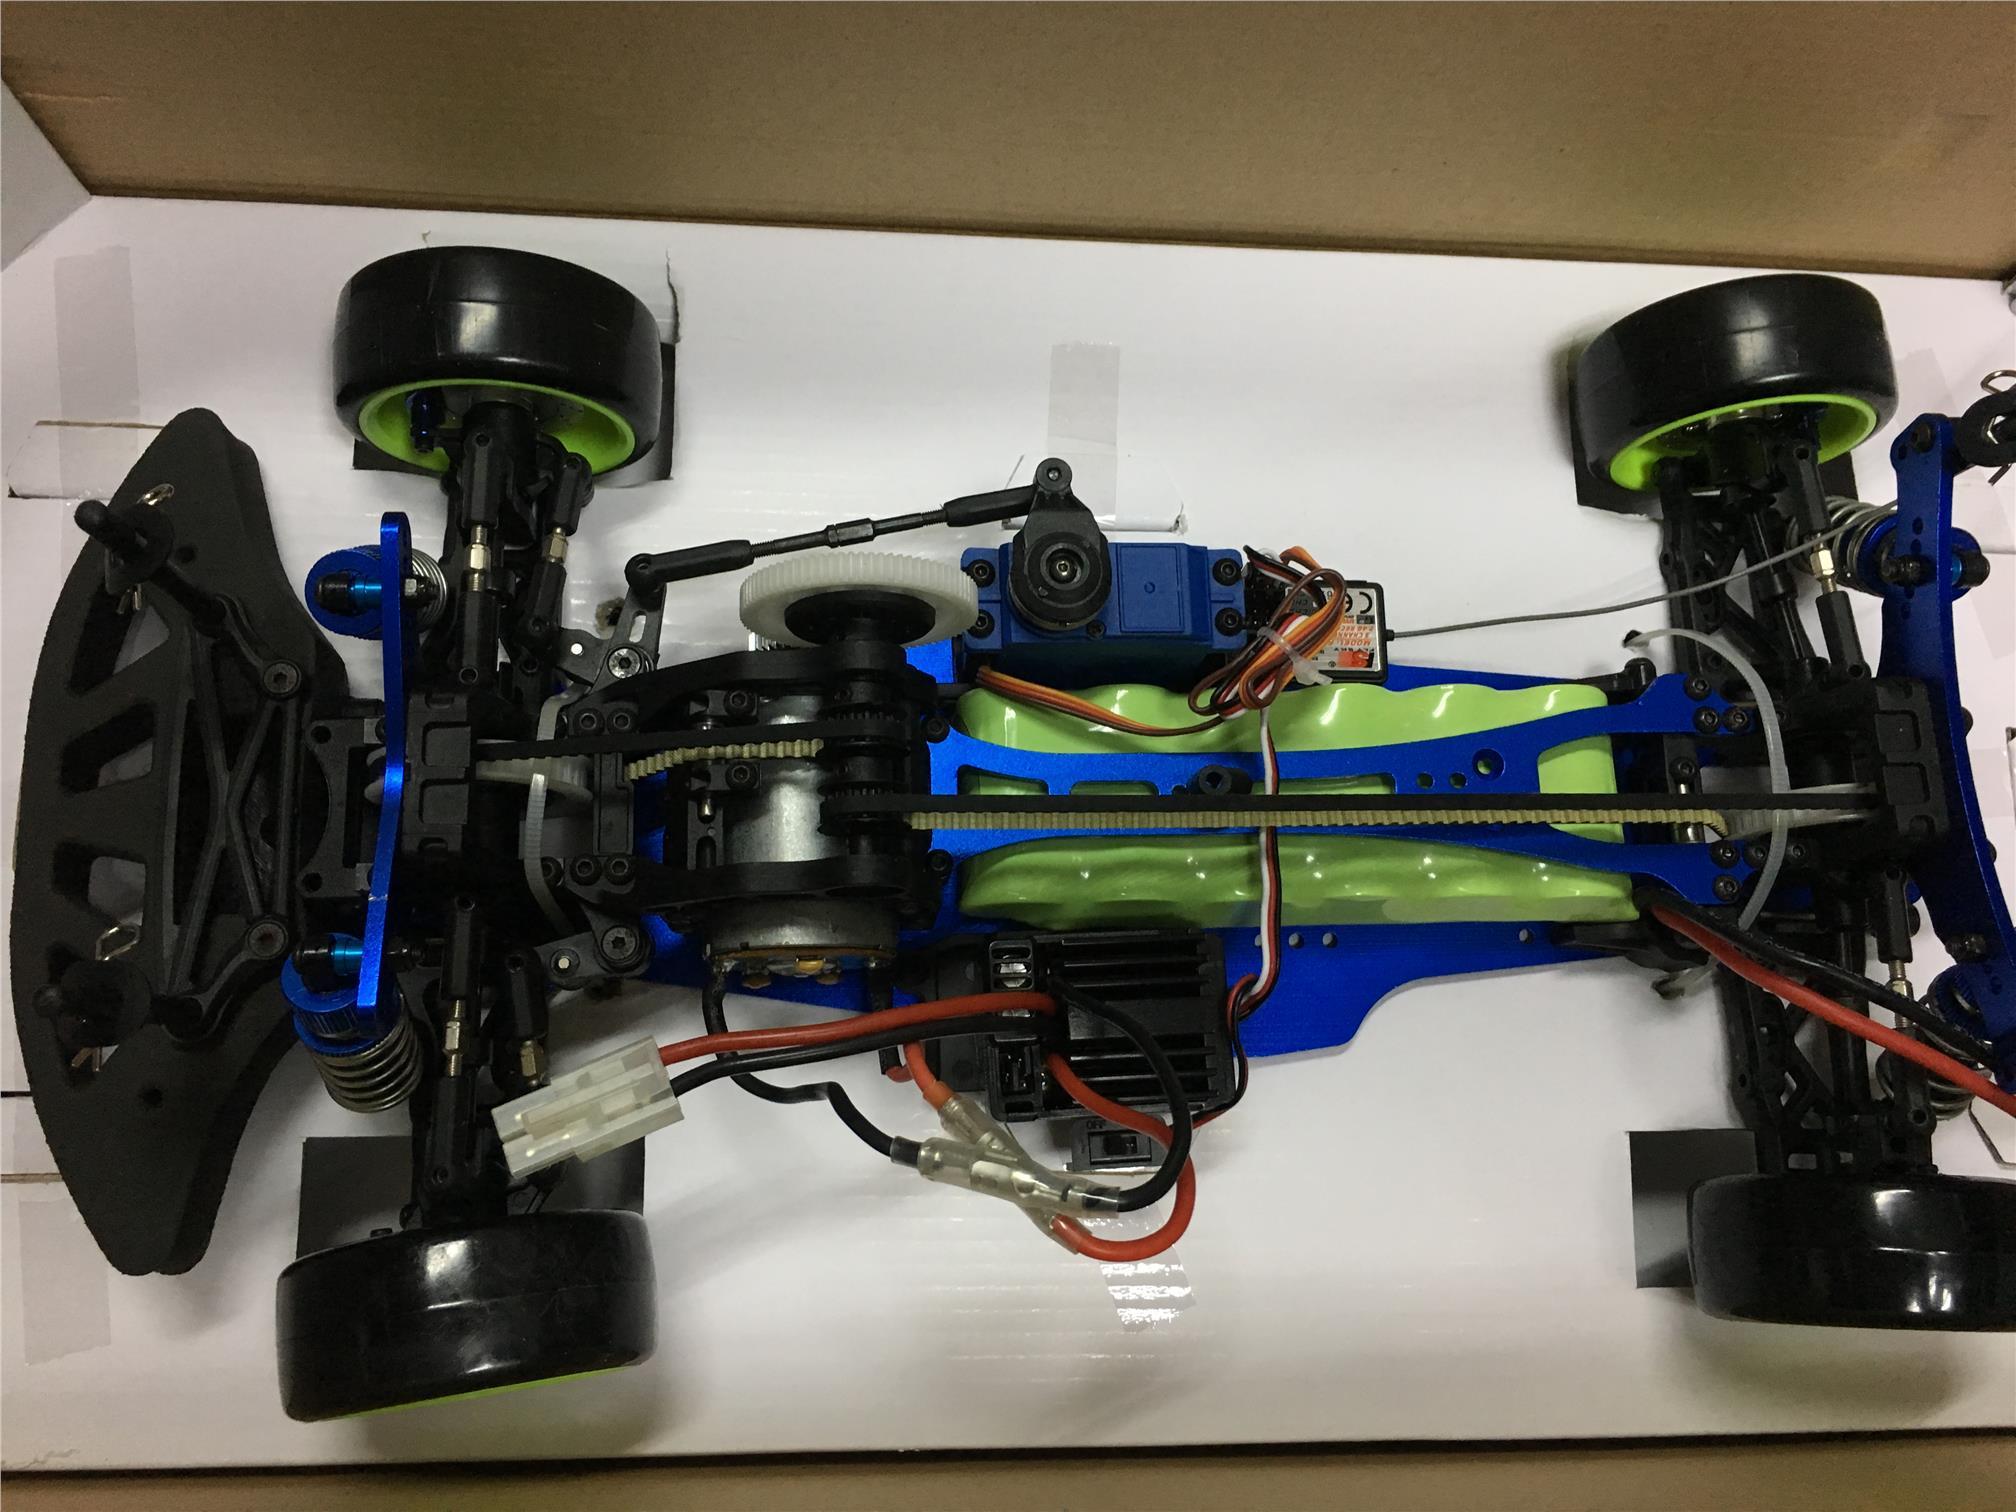 Vantex Yokomo 1 10 Rc Car Drift Rtr End 10 31 2017 6 15 Pm